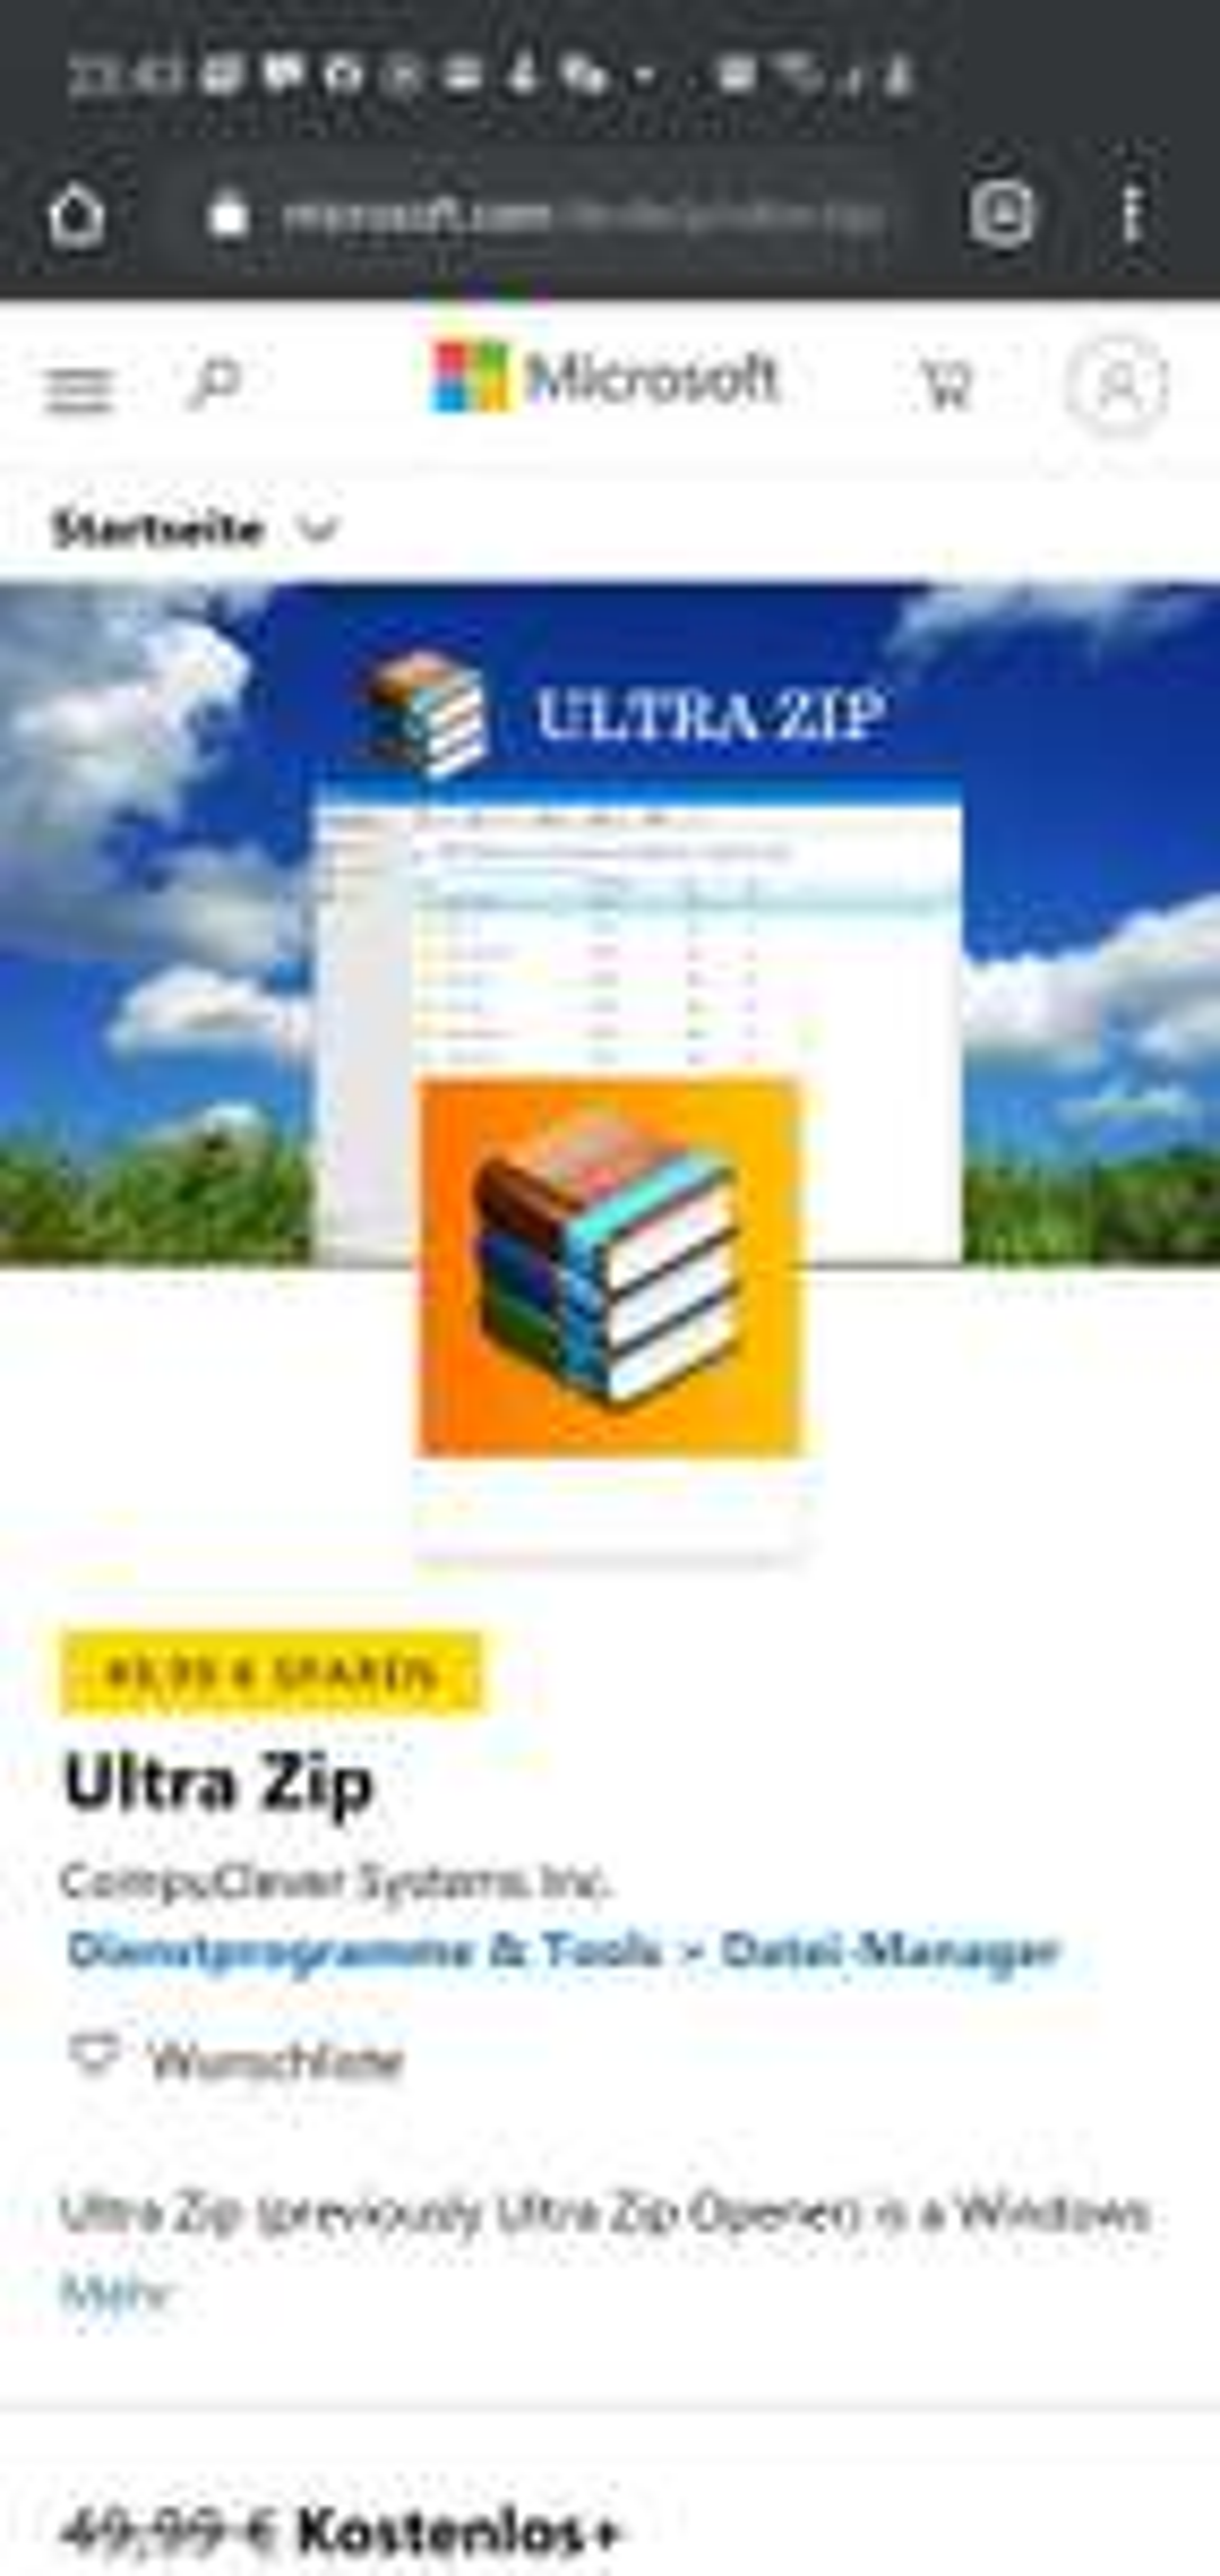 Windows store: Ultra zip kostenlos statt 49.99 4.5 sterne